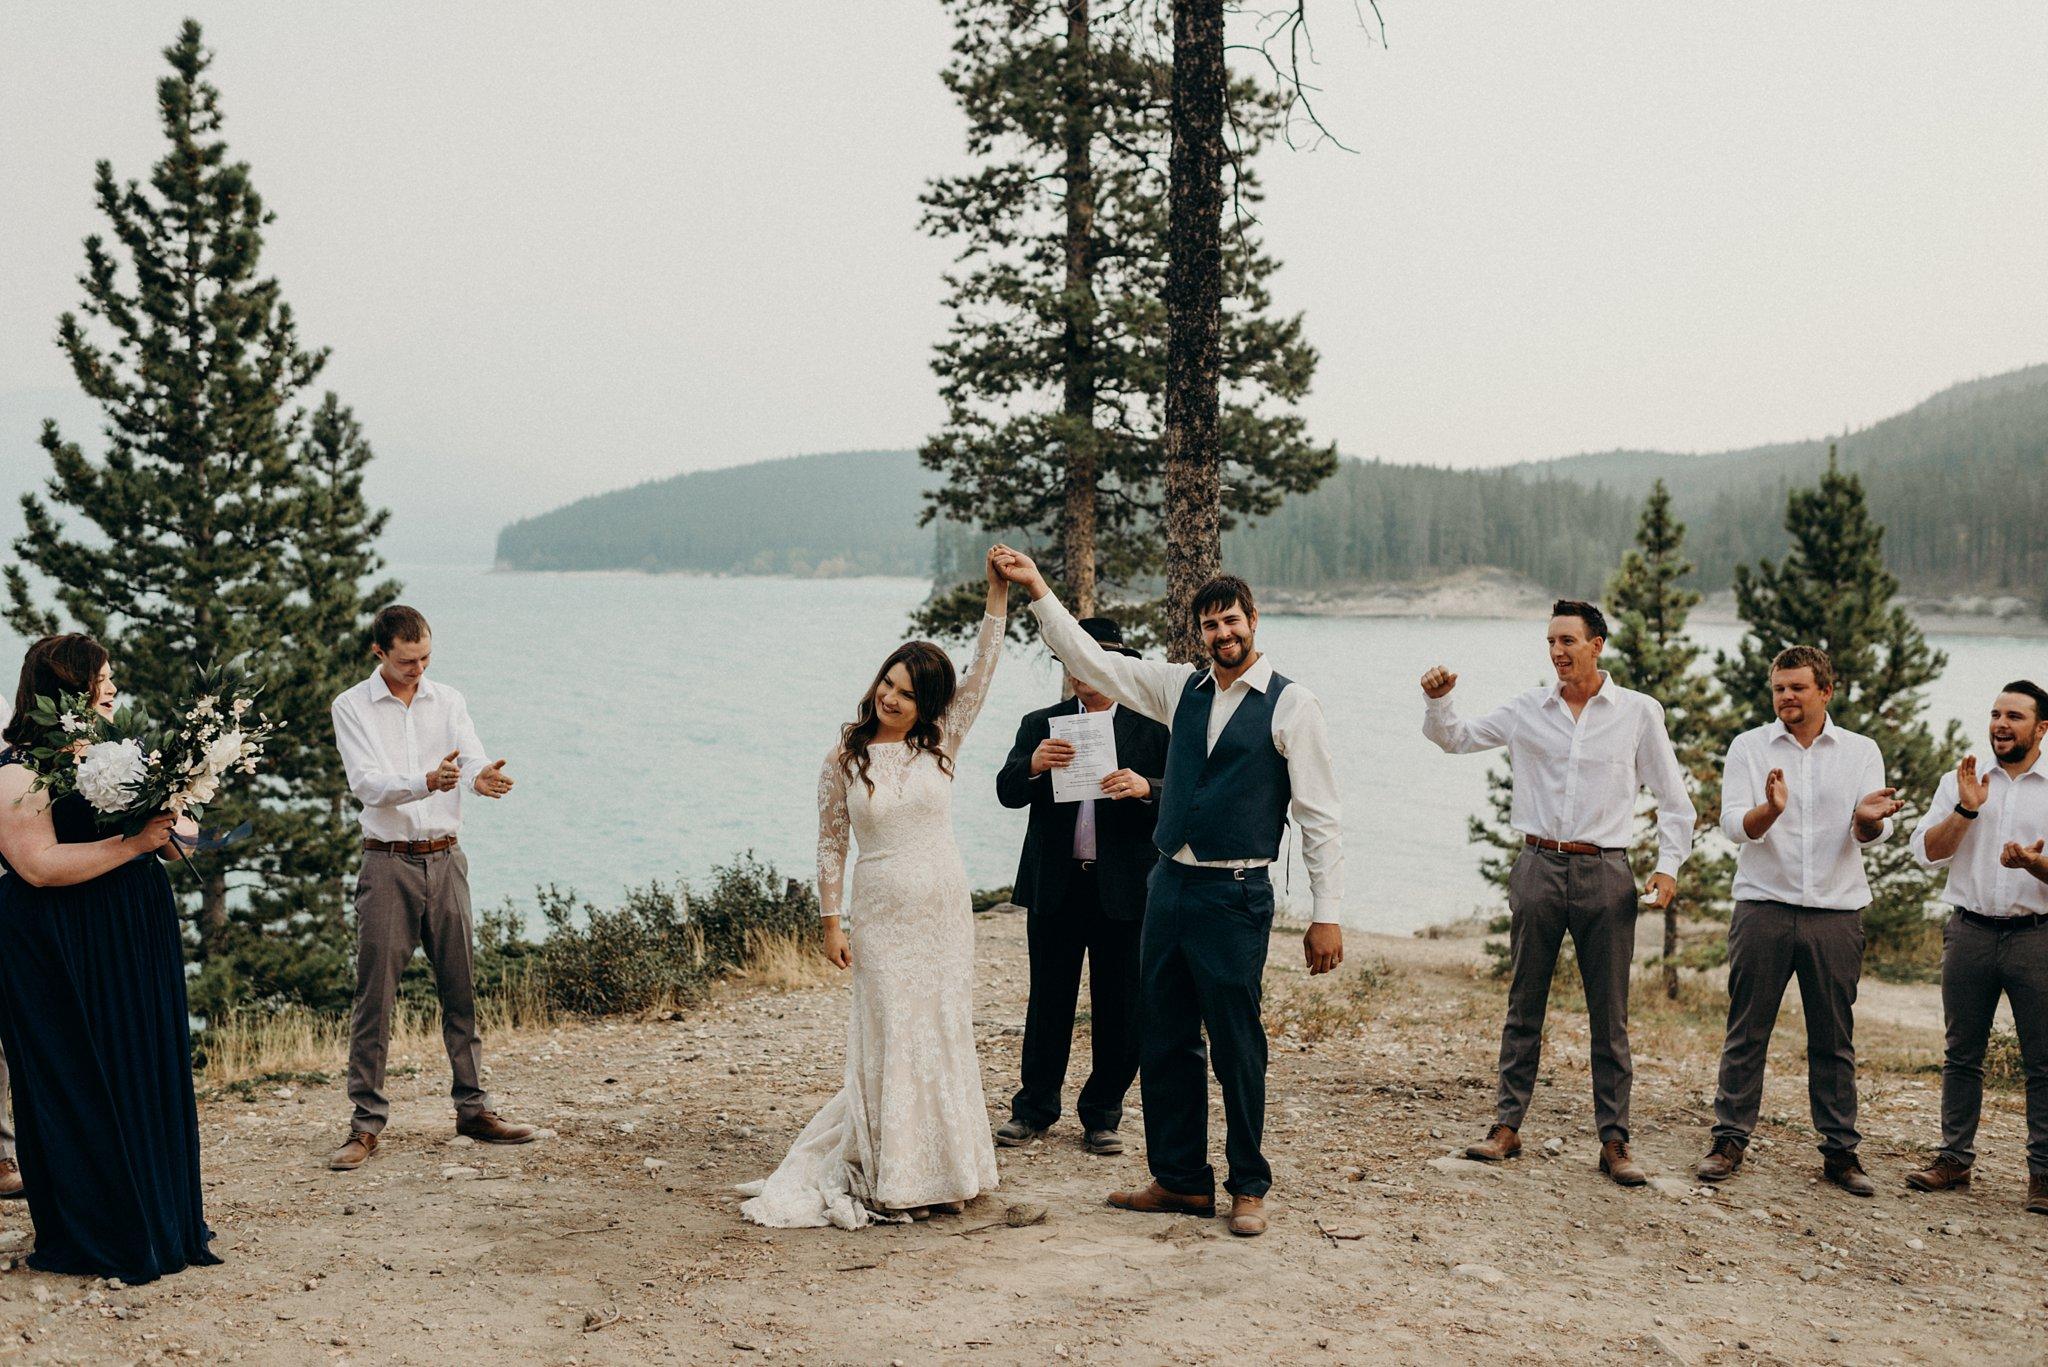 kaihla_tonai_intimate_wedding_elopement_photographer_6728.jpg